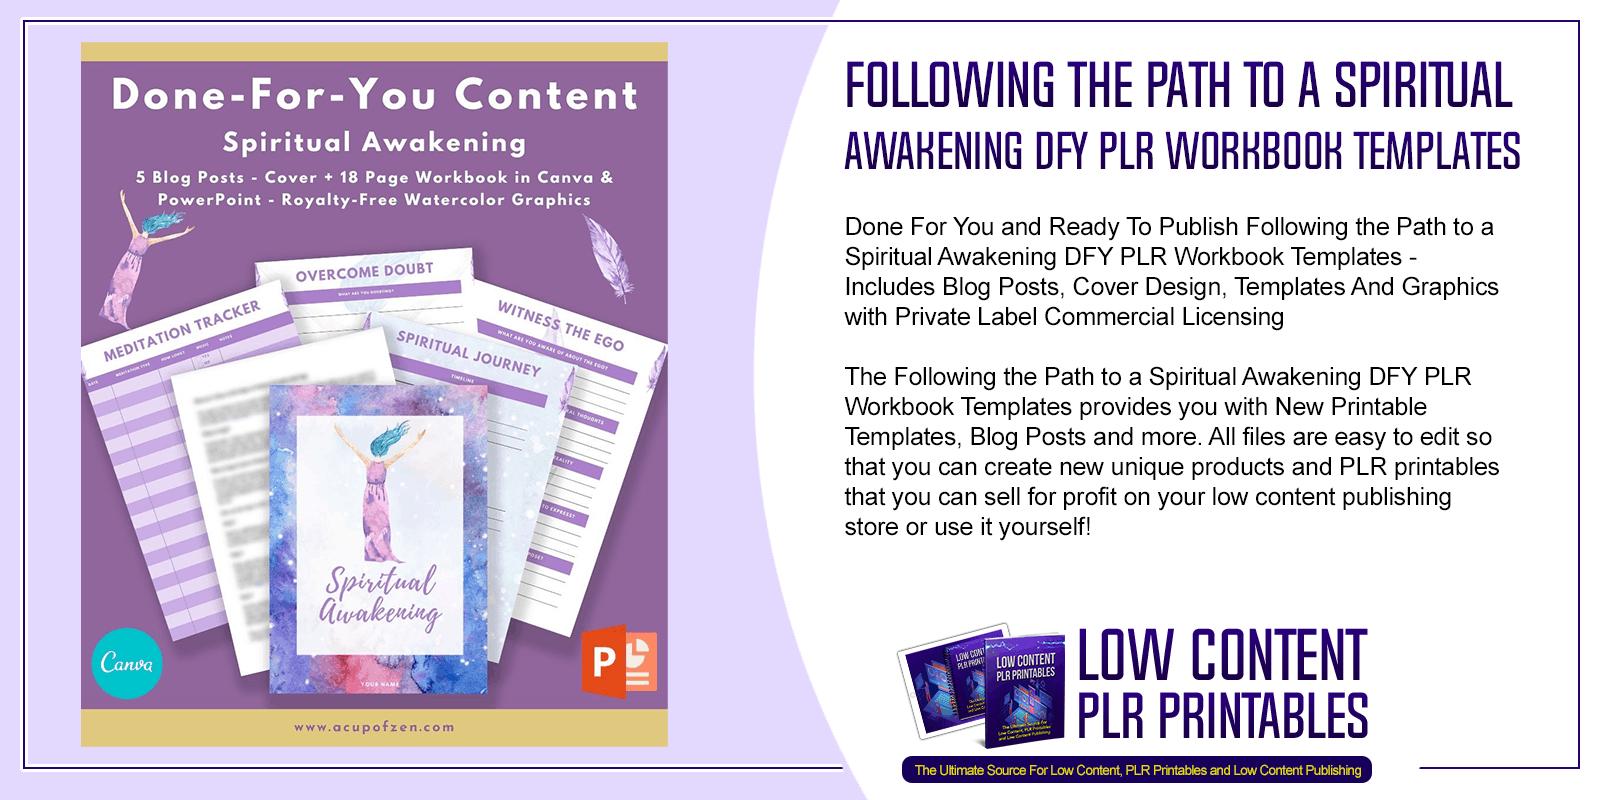 Following the Path to a Spiritual Awakening DFY PLR Workbook Templates